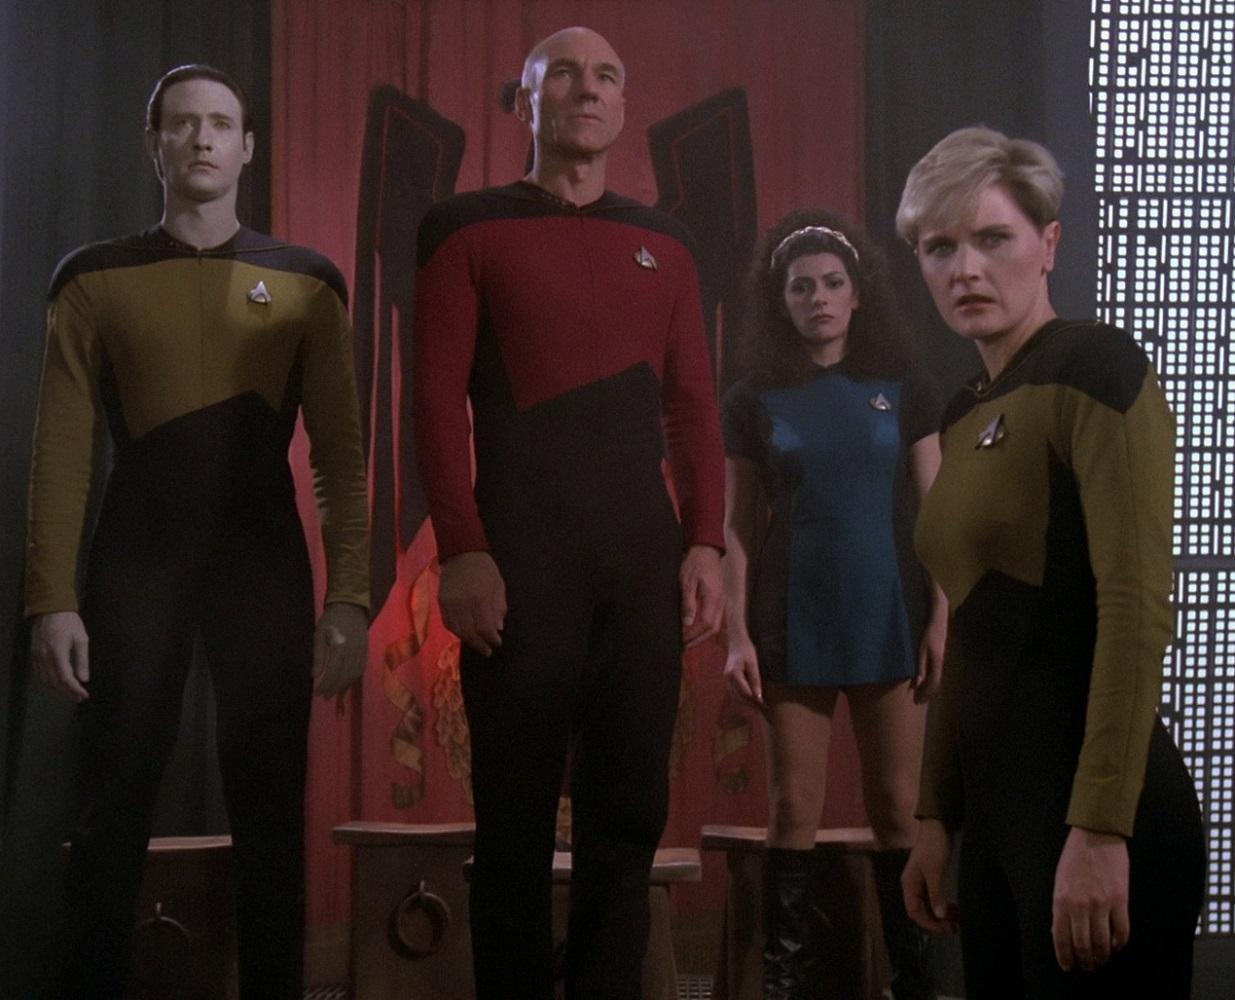 Changes star trek uniform Uniforms